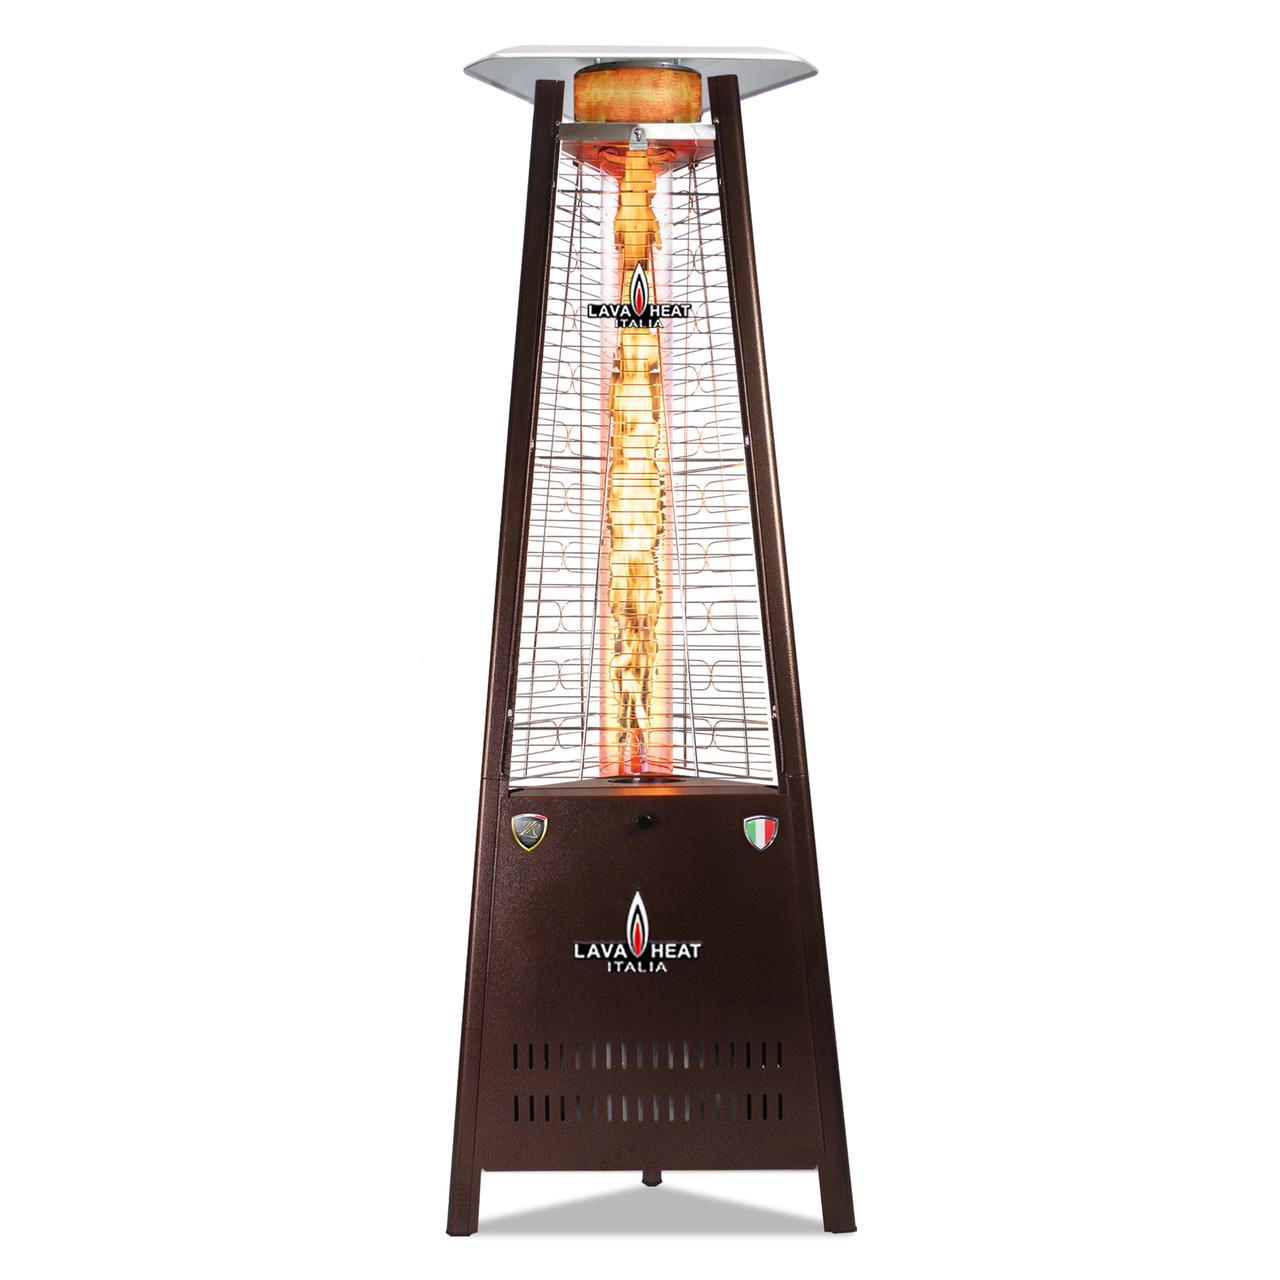 Lava Heat LP Capri Triangle Flame Tower Heater - Heritage Bronze